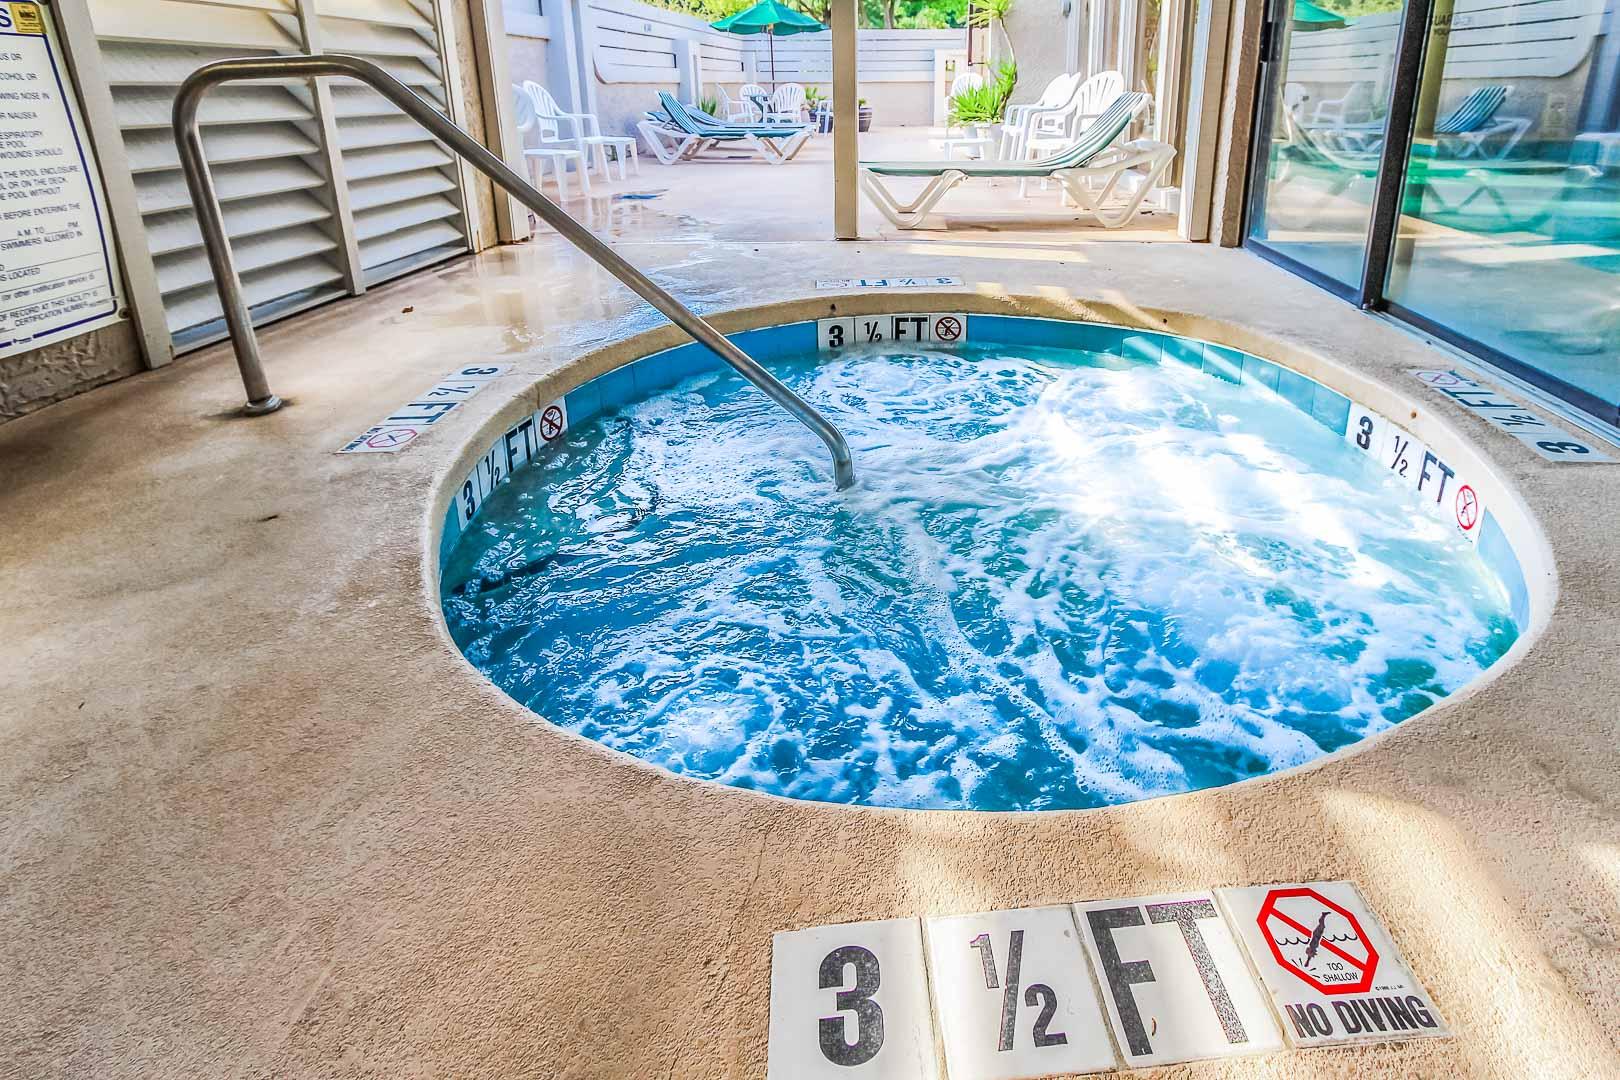 A relaxing Jacuzzi tub at VRI's Players Club Resort in Hilton Head Island, South Carolina.